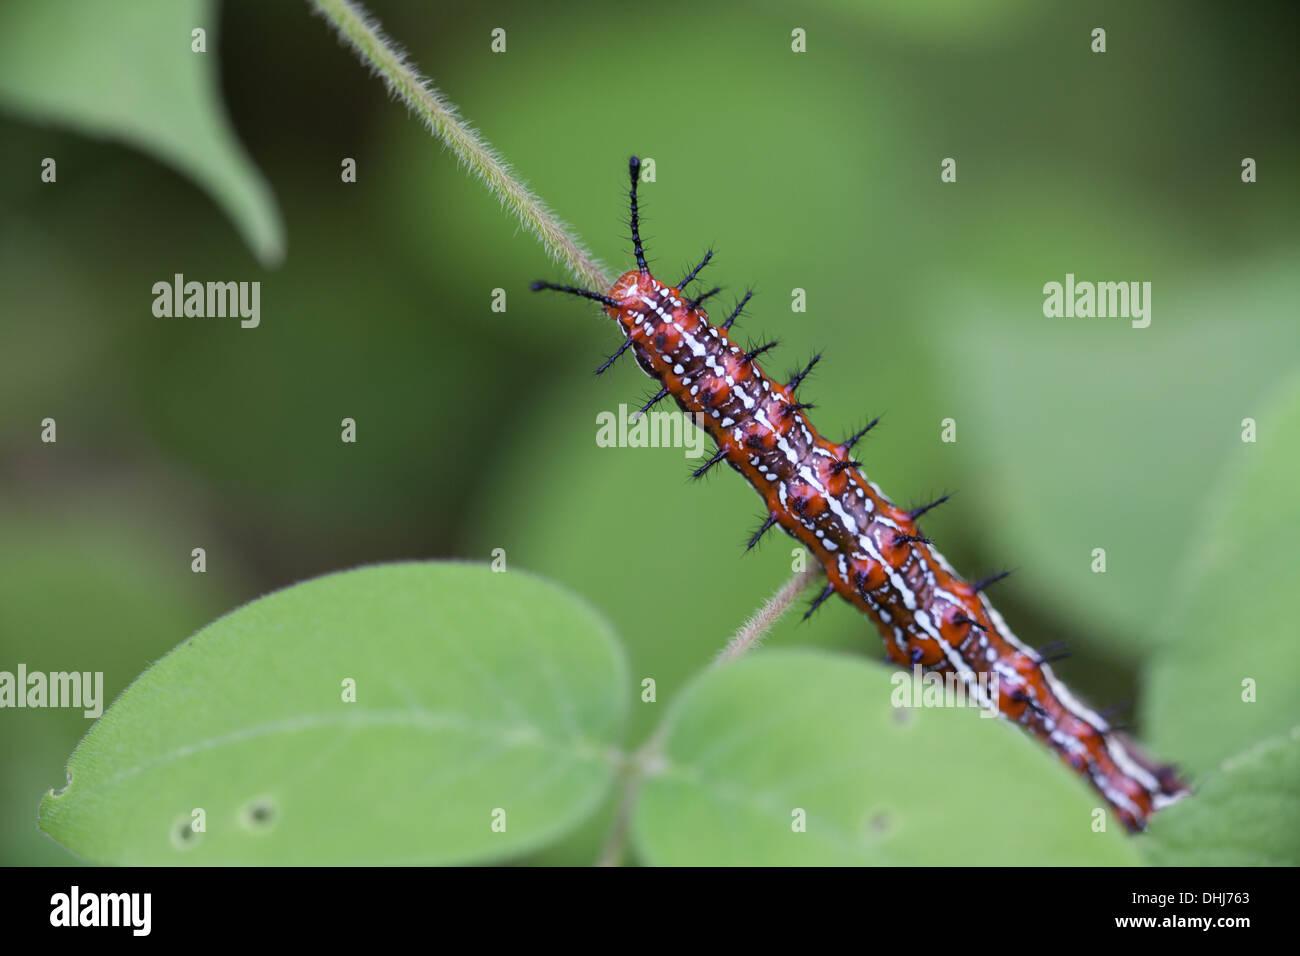 Caterpillar in Cienaga las Macanas Nature Reserve, Herrera province, Republic of Panama. Stock Photo